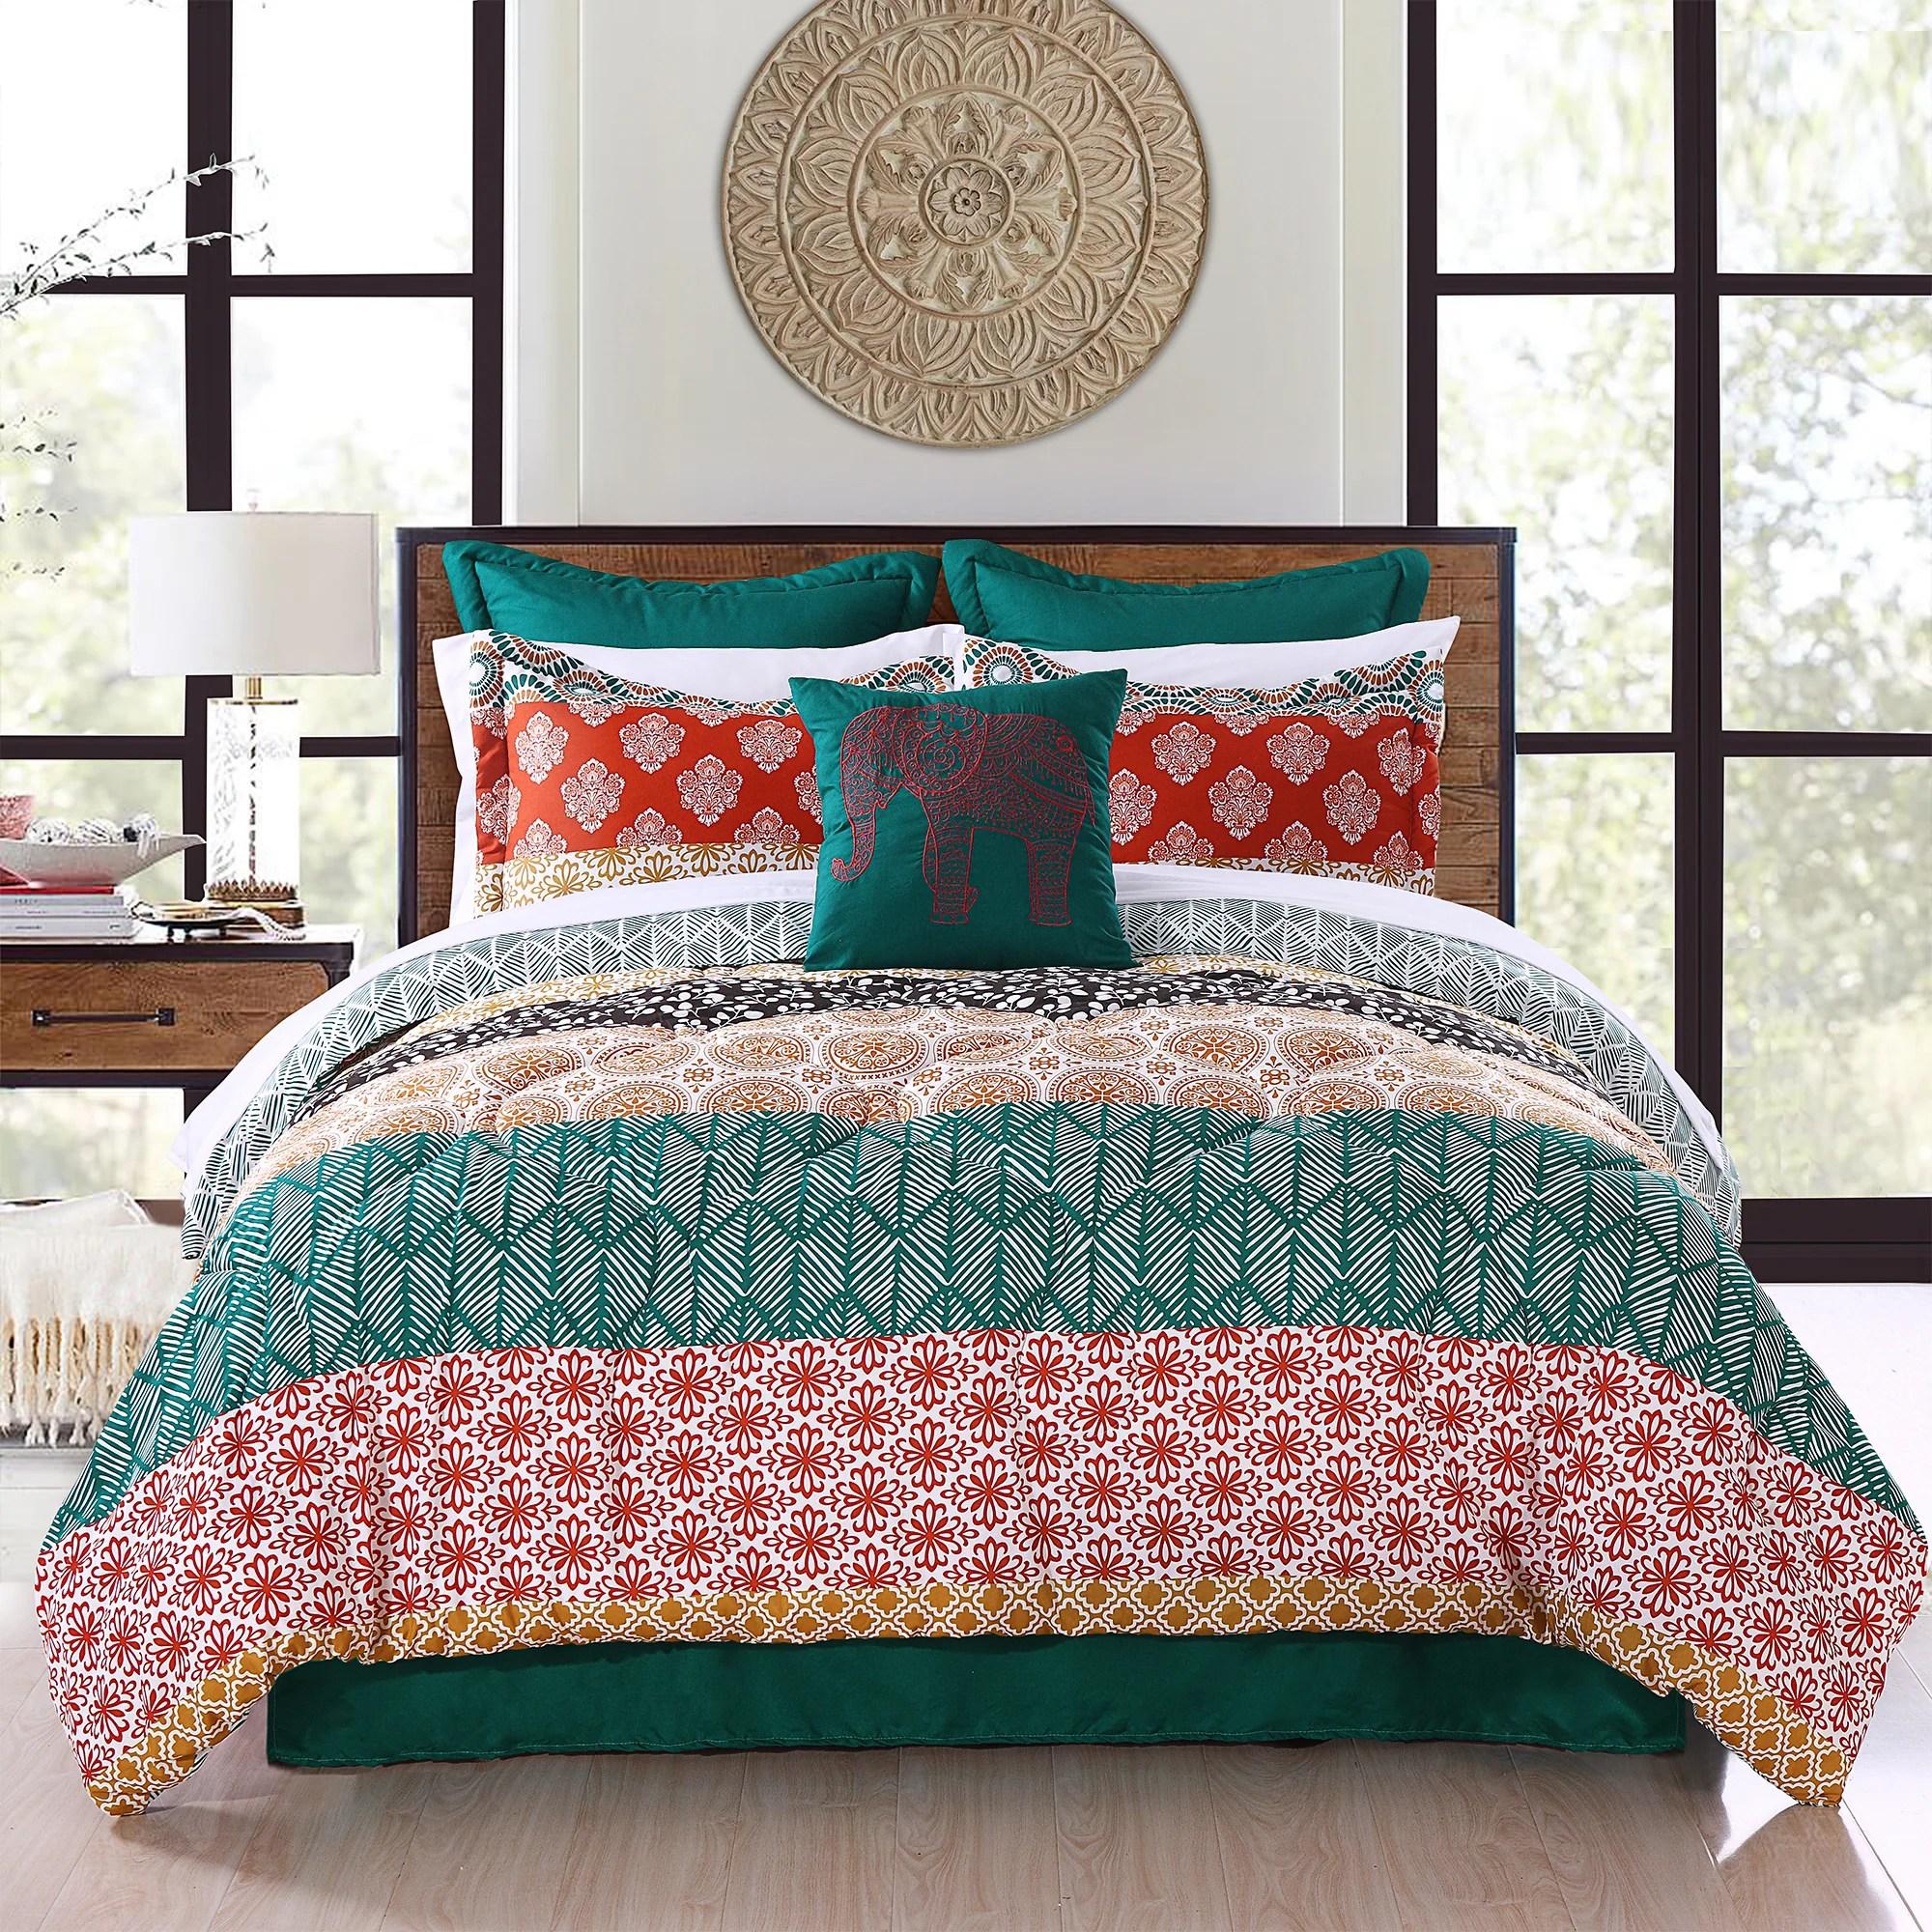 bohemian stripe 7 piece comforter set full queen turquoise orange